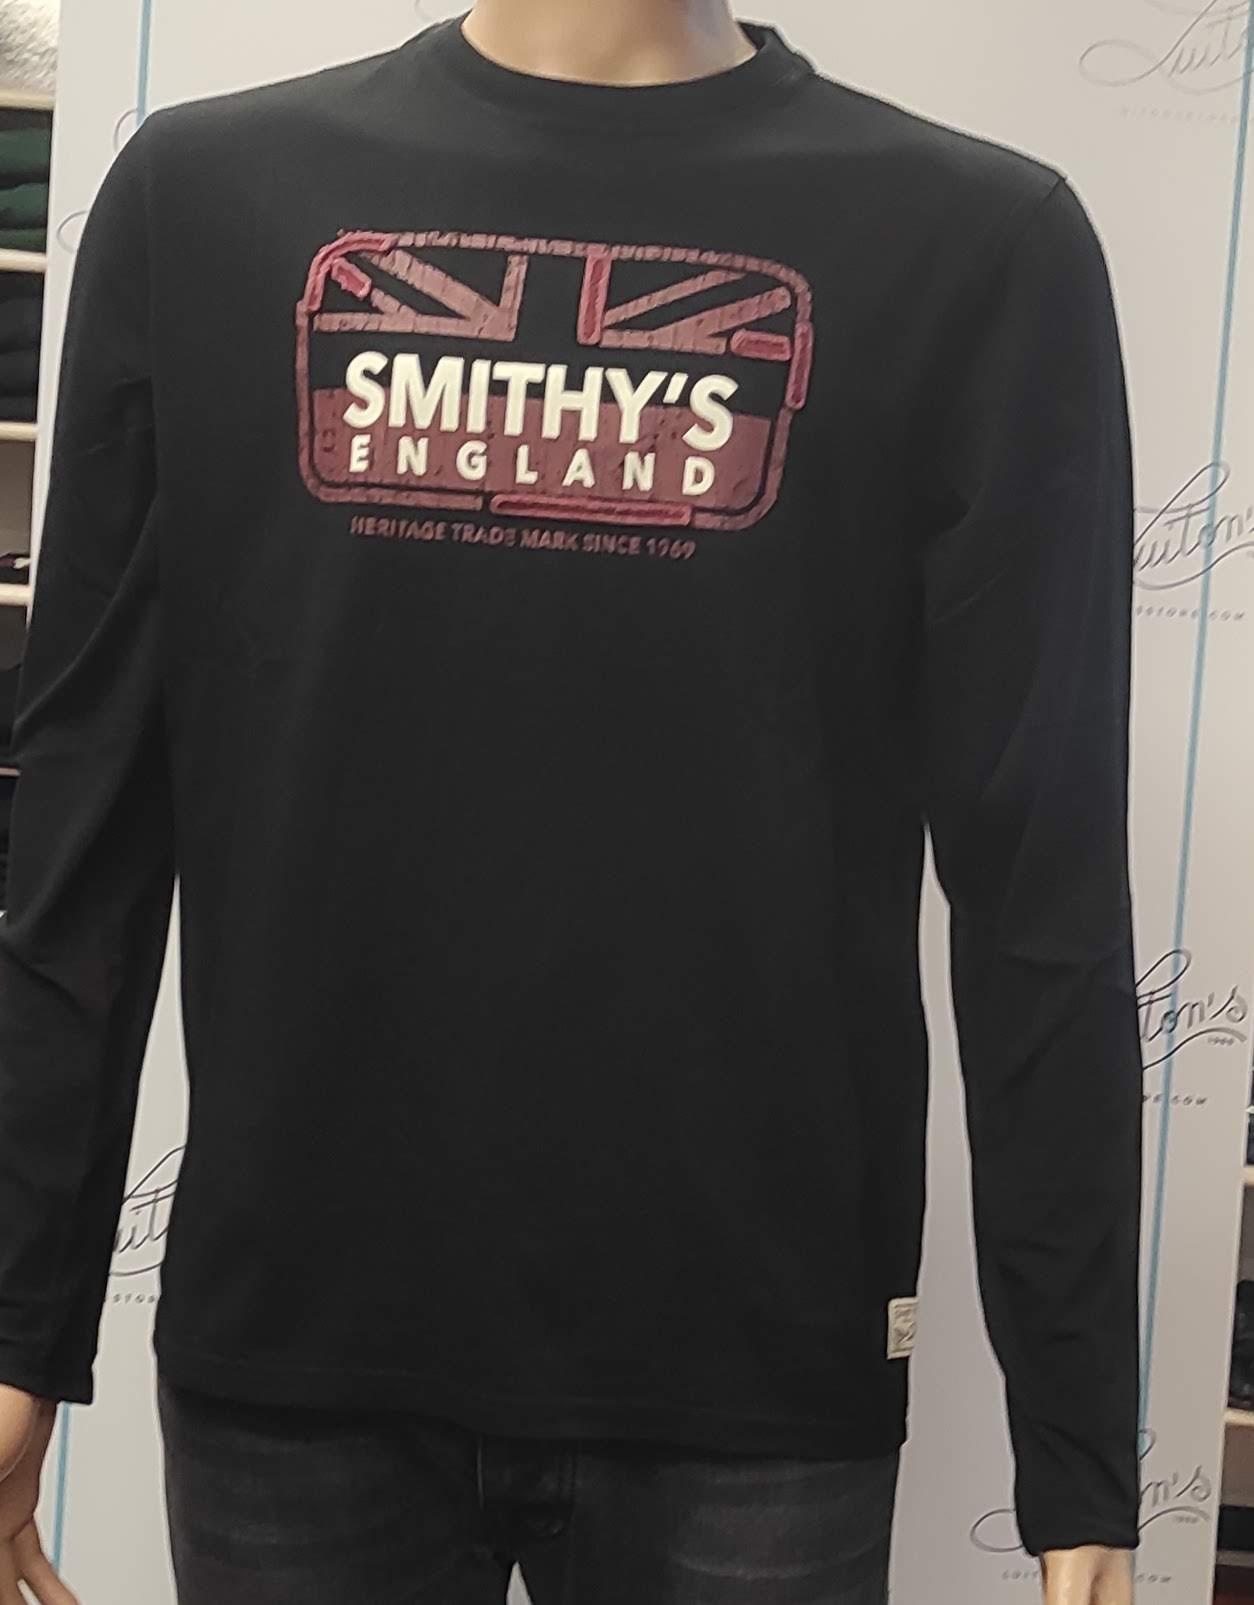 Maglia Smithy's England